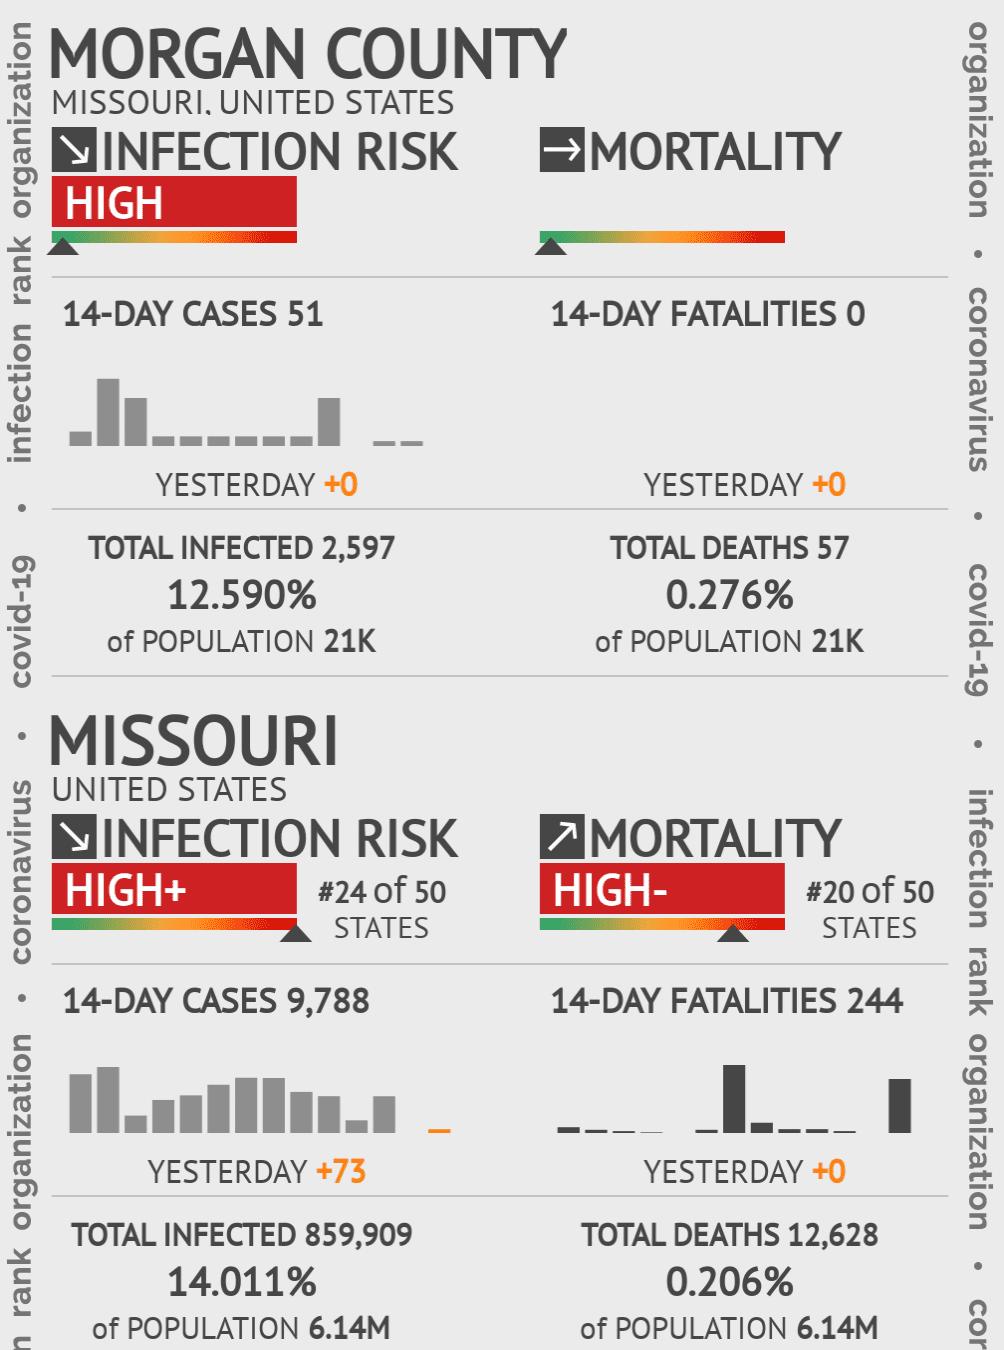 Morgan County Coronavirus Covid-19 Risk of Infection on July 24, 2021